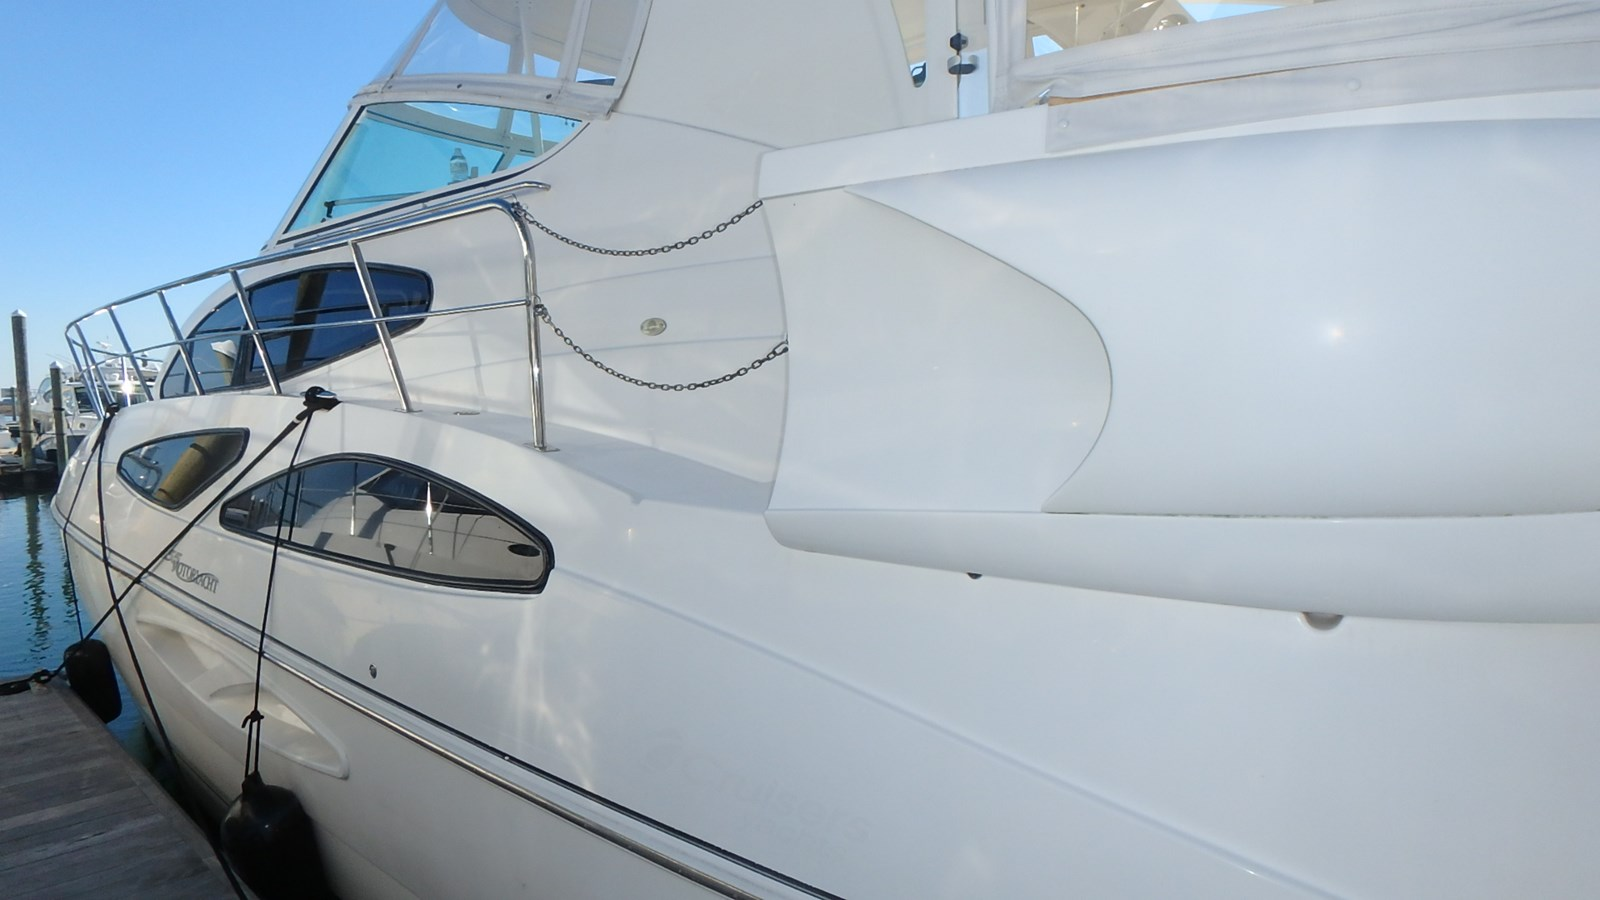 P1160913 2005 CRUISERS YACHTS 455 Express Motoryacht Motor Yacht 2522139